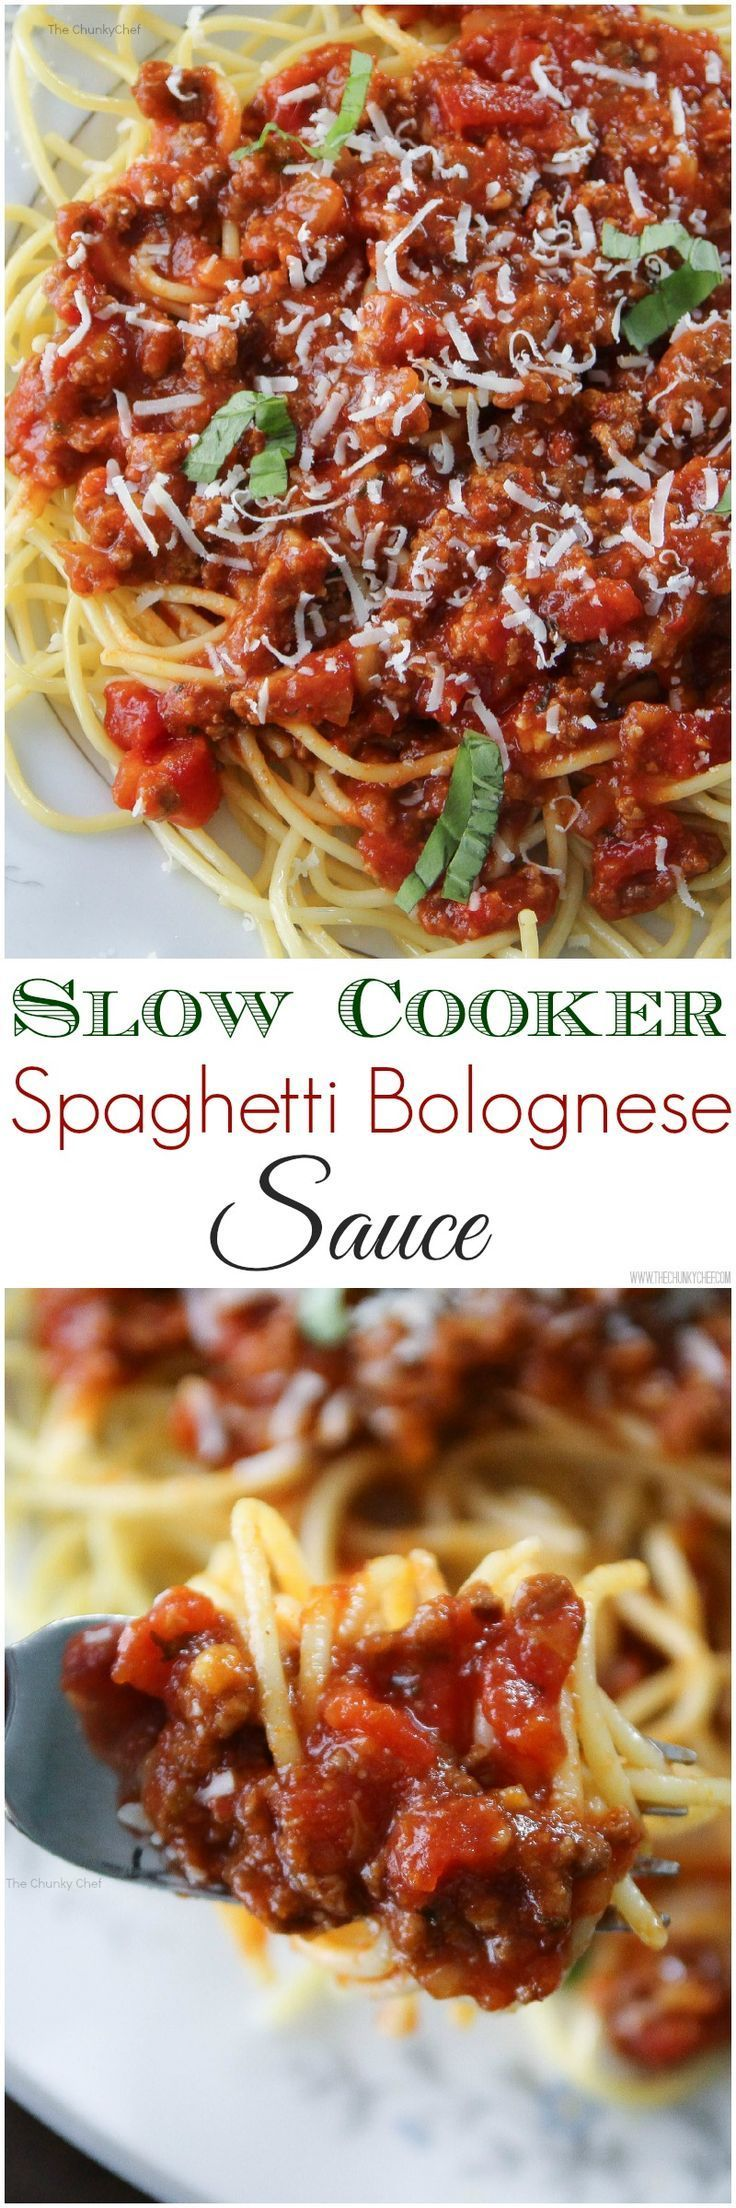 Spaghetti Bolognese – Imagine your favorite spaghetti bolognese sauce, simmered …